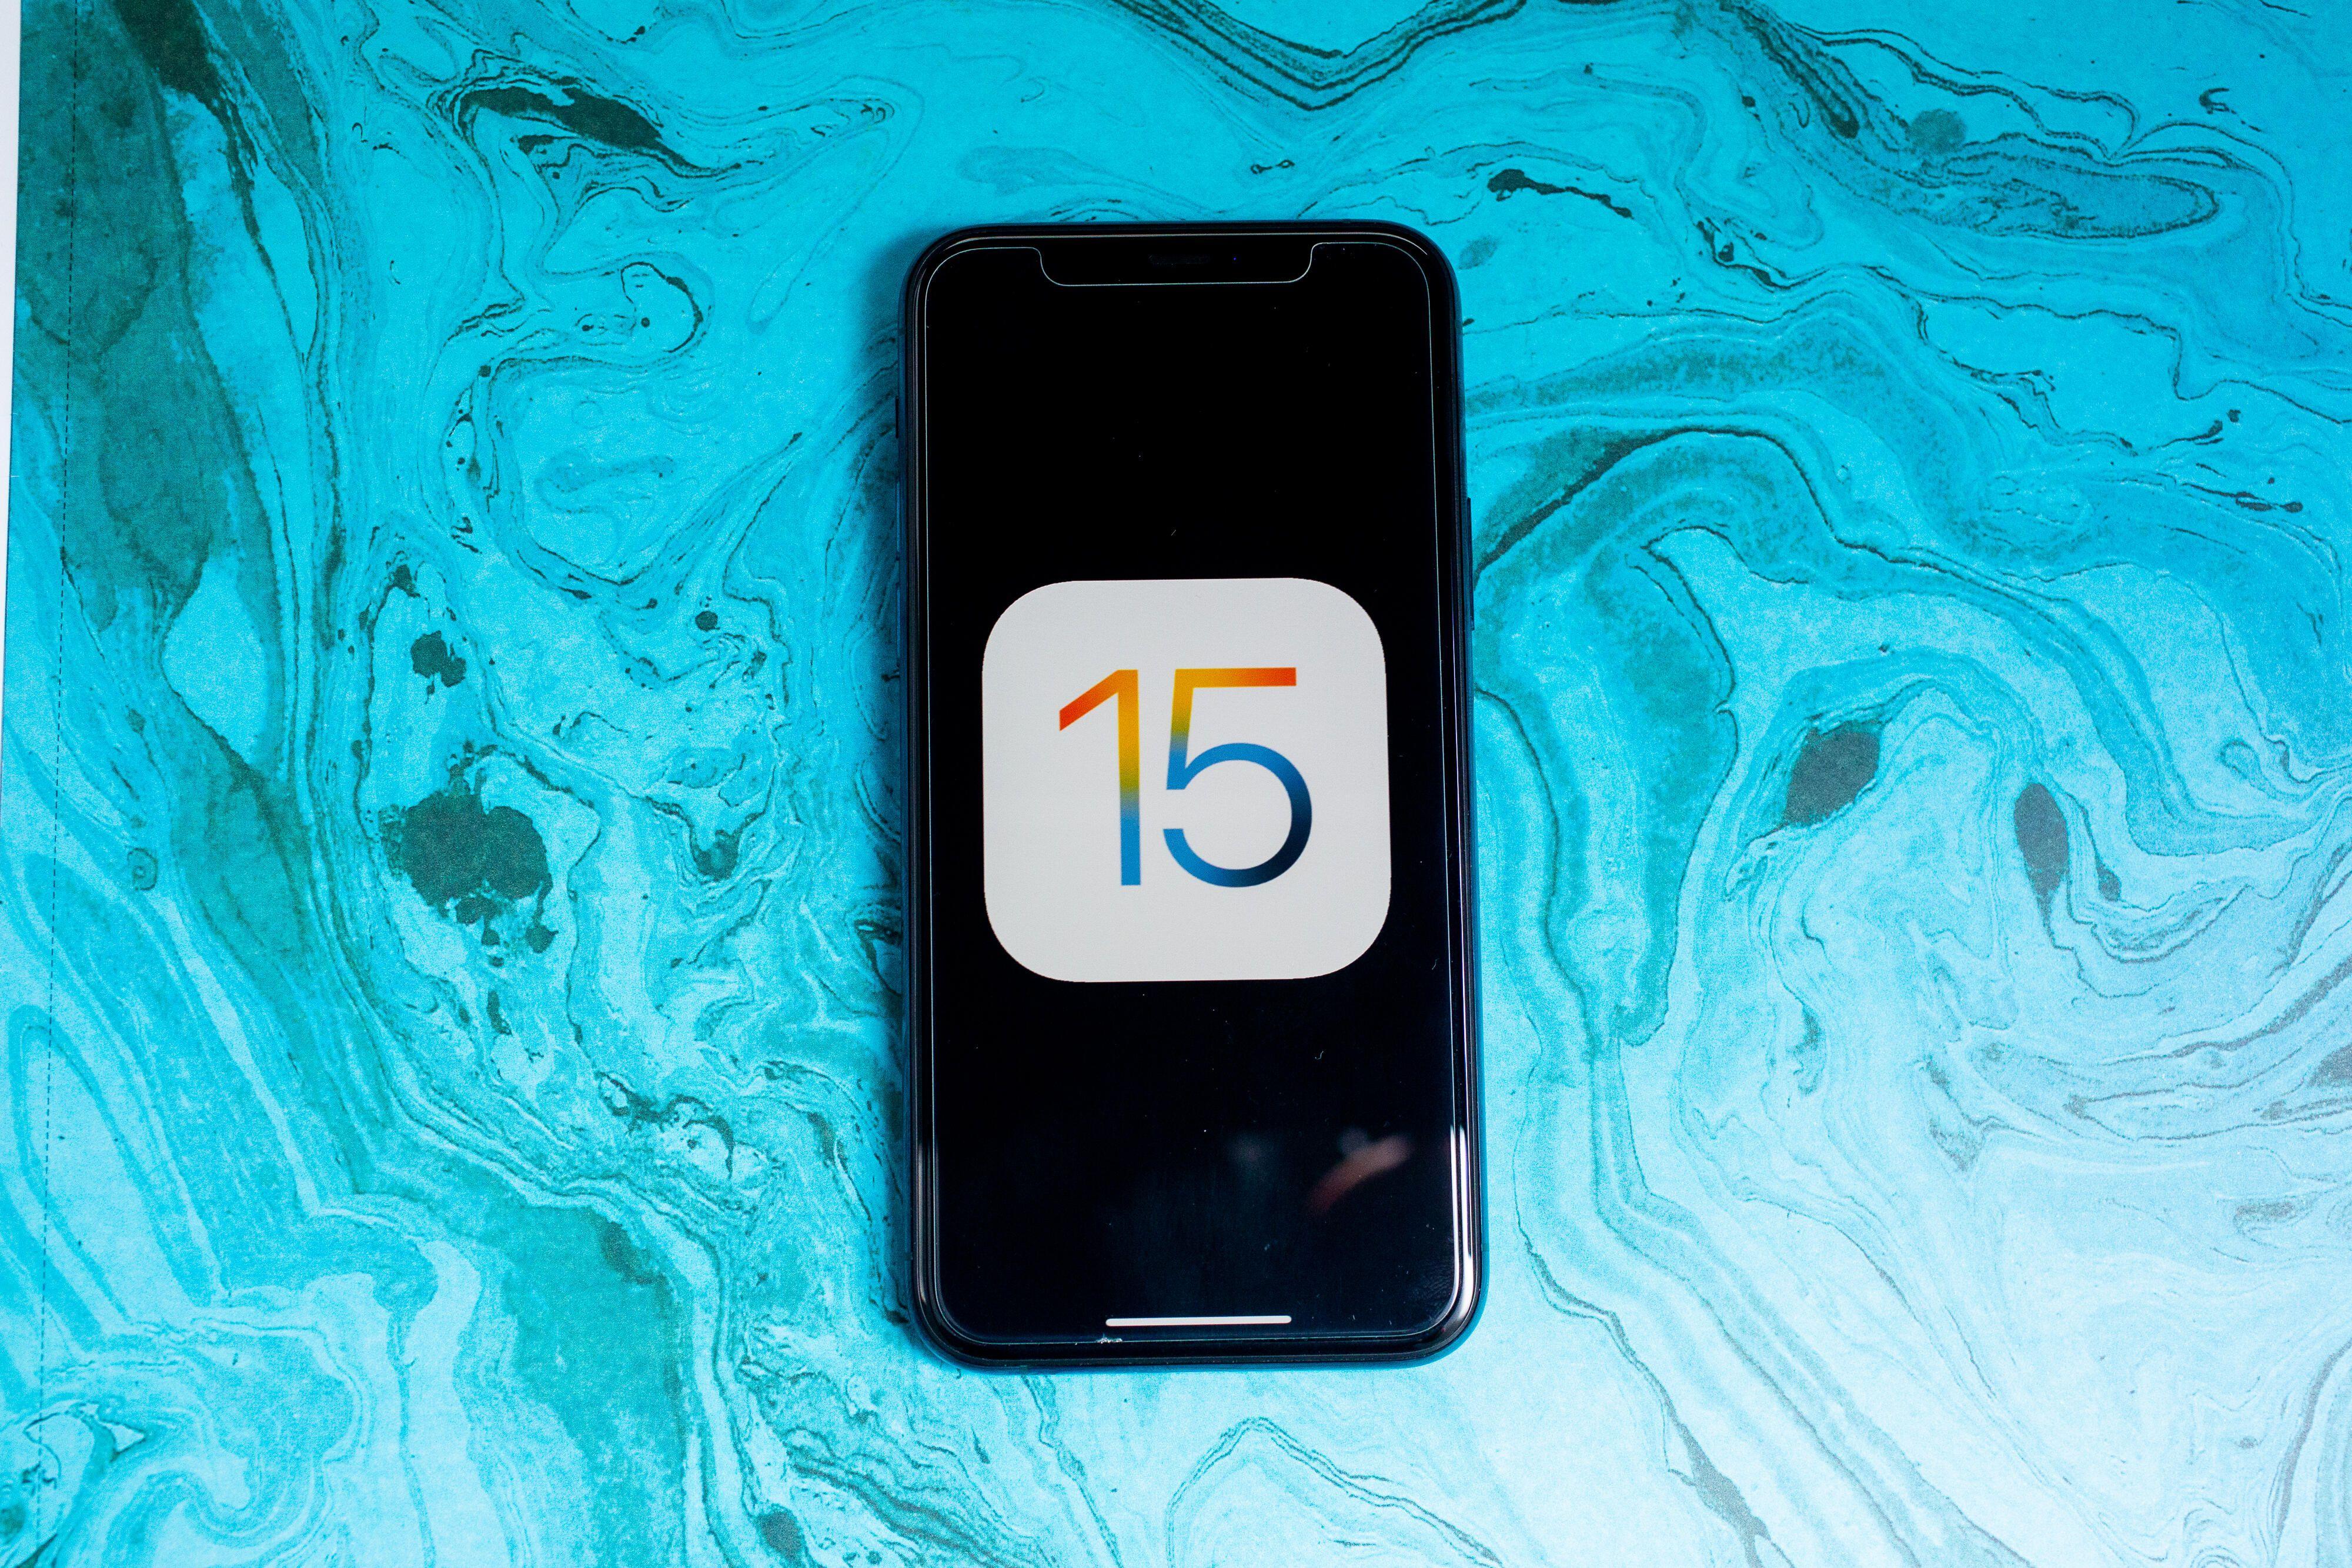 iphone-ios-15-2021-cnet-06